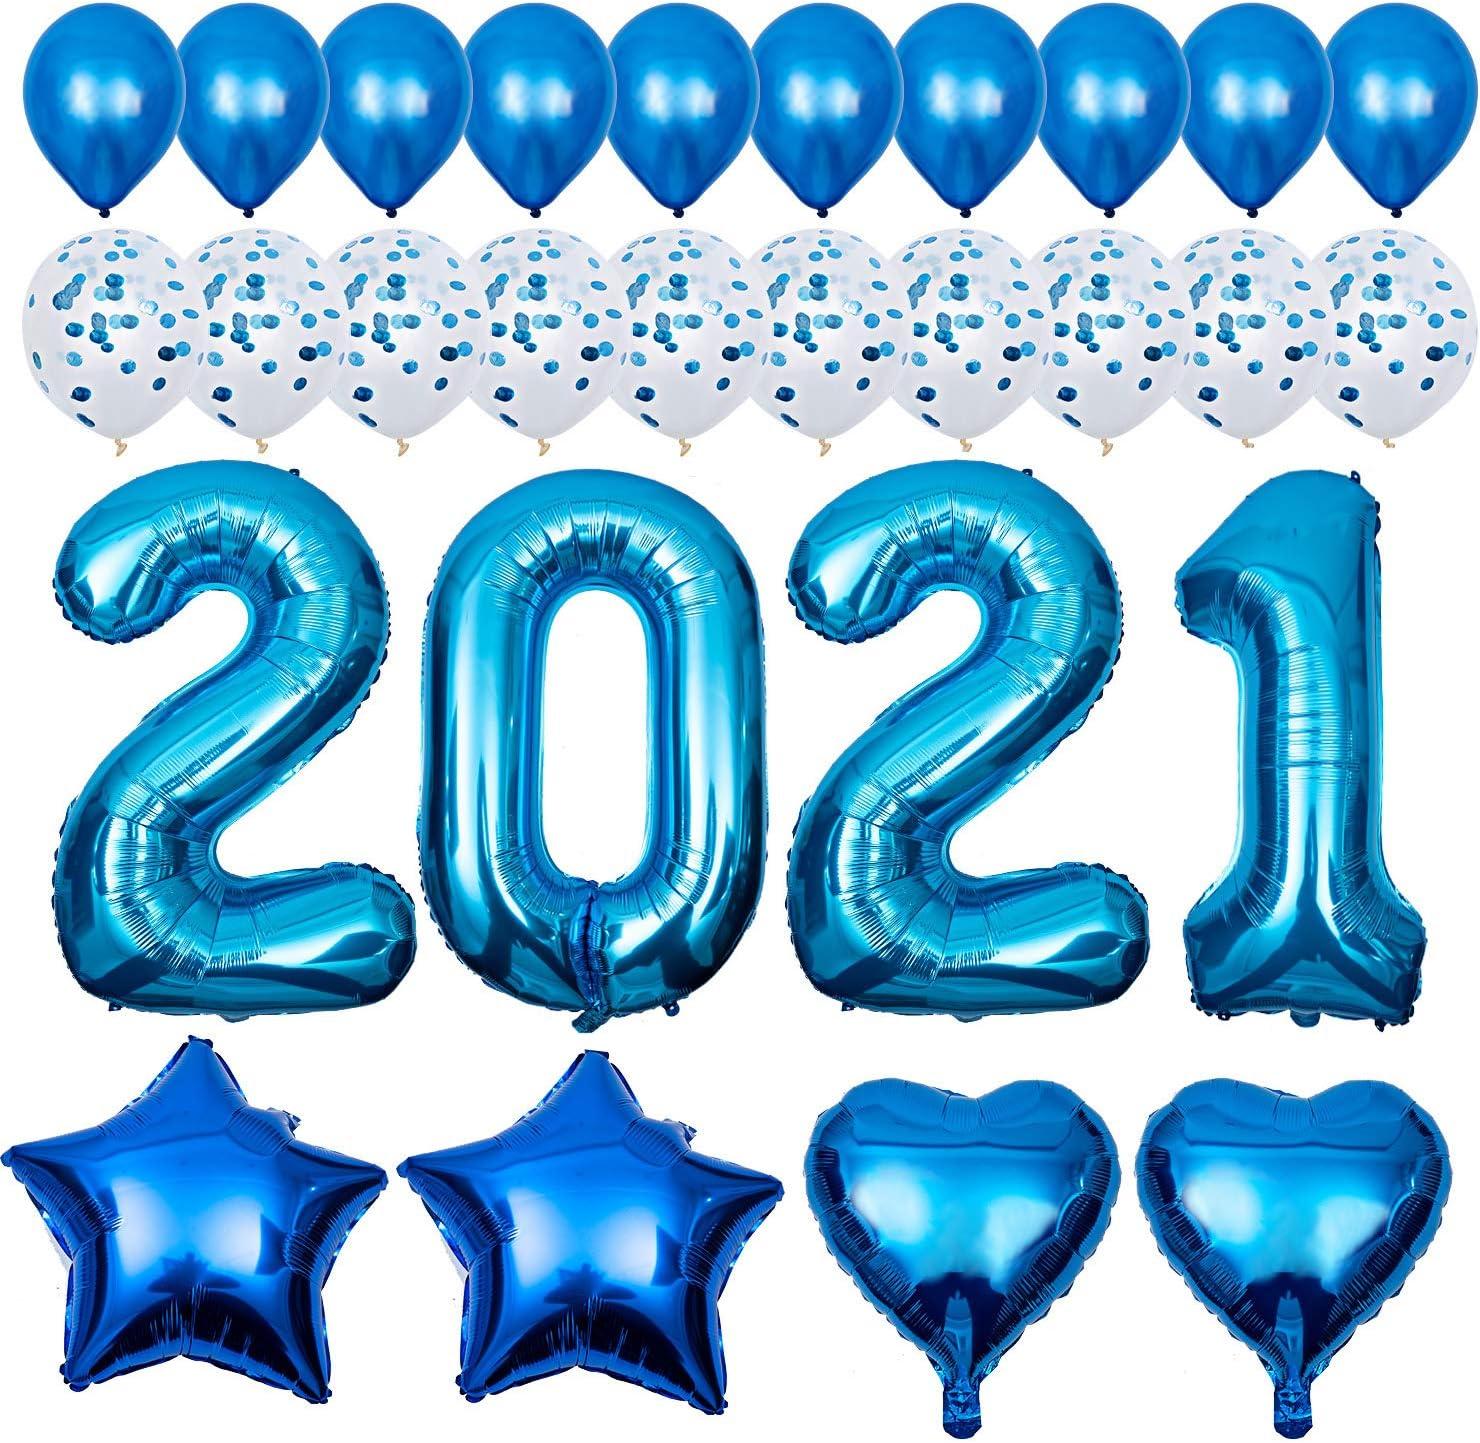 300x Balloons Balloons Balloon Air Helium Blue Wedding Deco Decoration